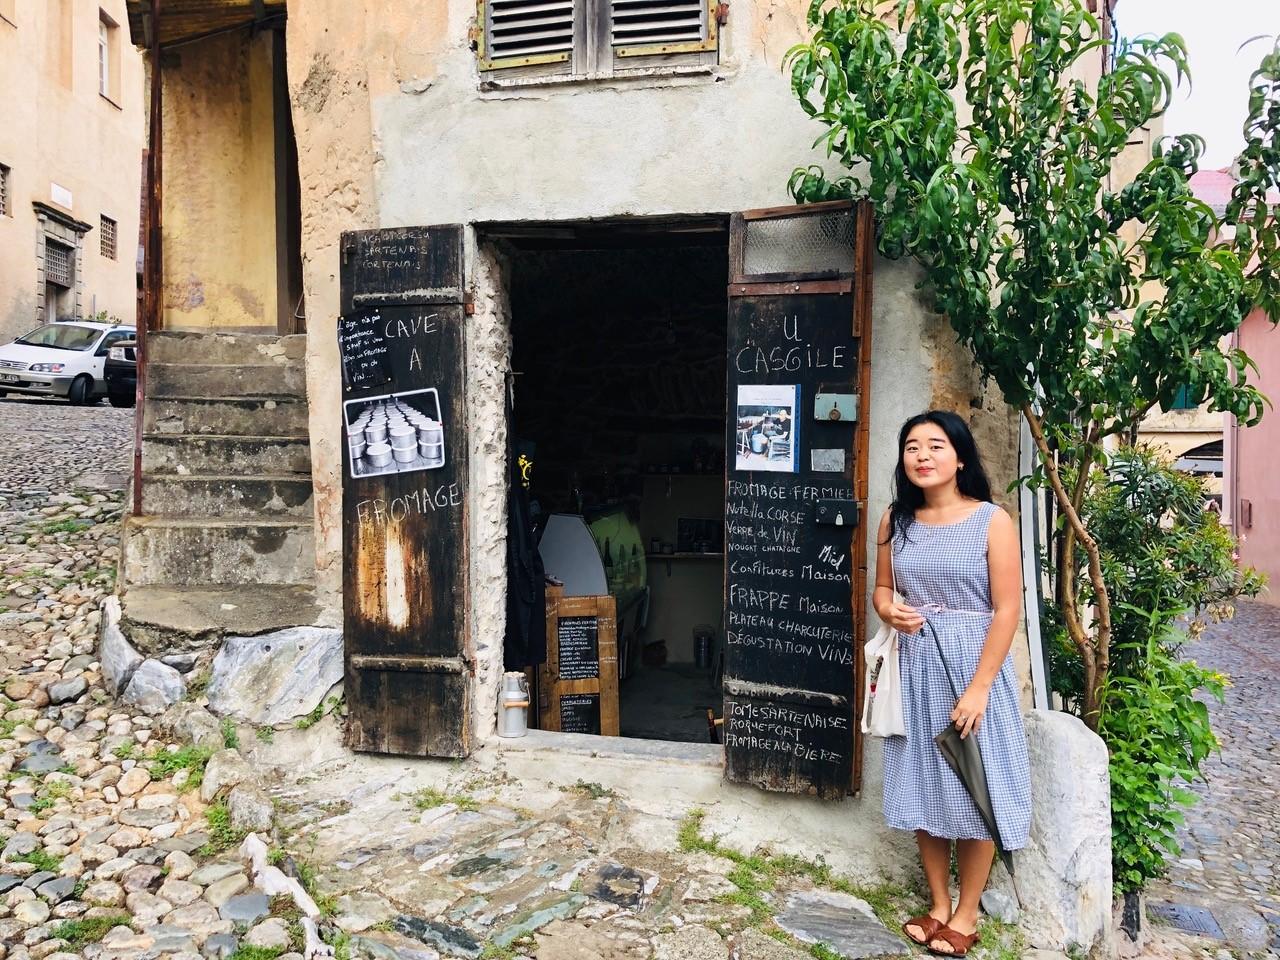 restaurant in corsica, france